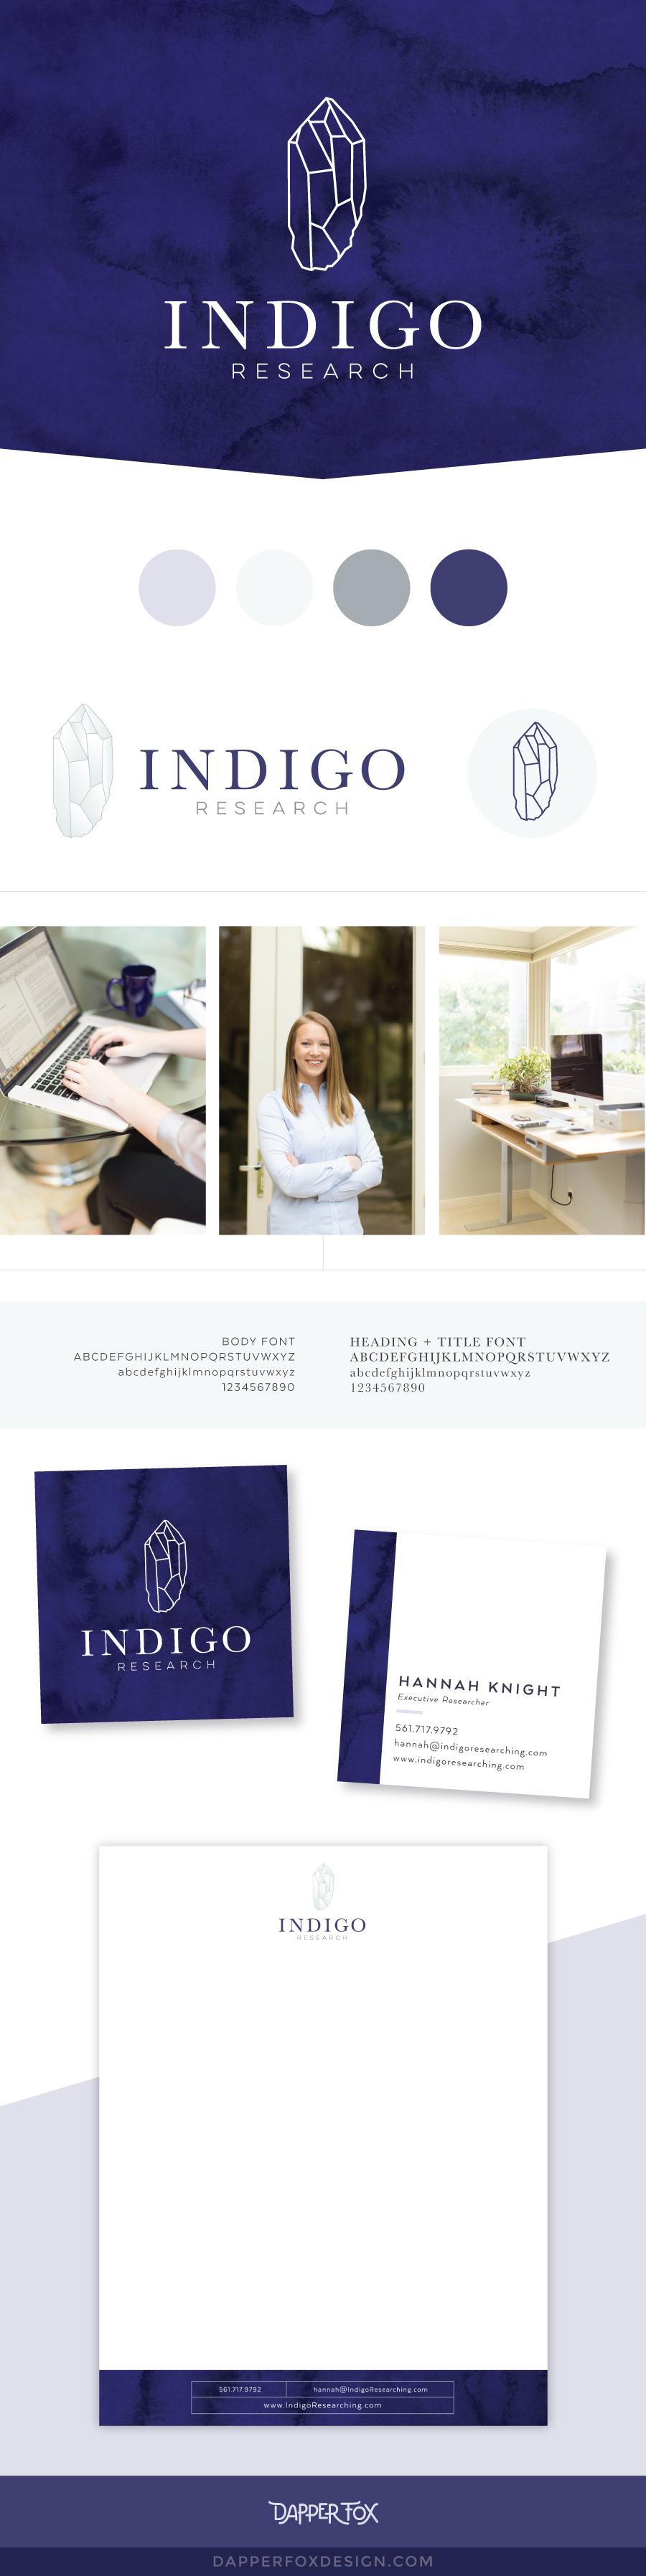 Logo and Branding Board for Indigo Research - Dapper Fox Design | logo concepts | logo design, logo, designer, brand designer, corporate, clean, minimalist, blue, business card | www.dapperfoxdesign.com